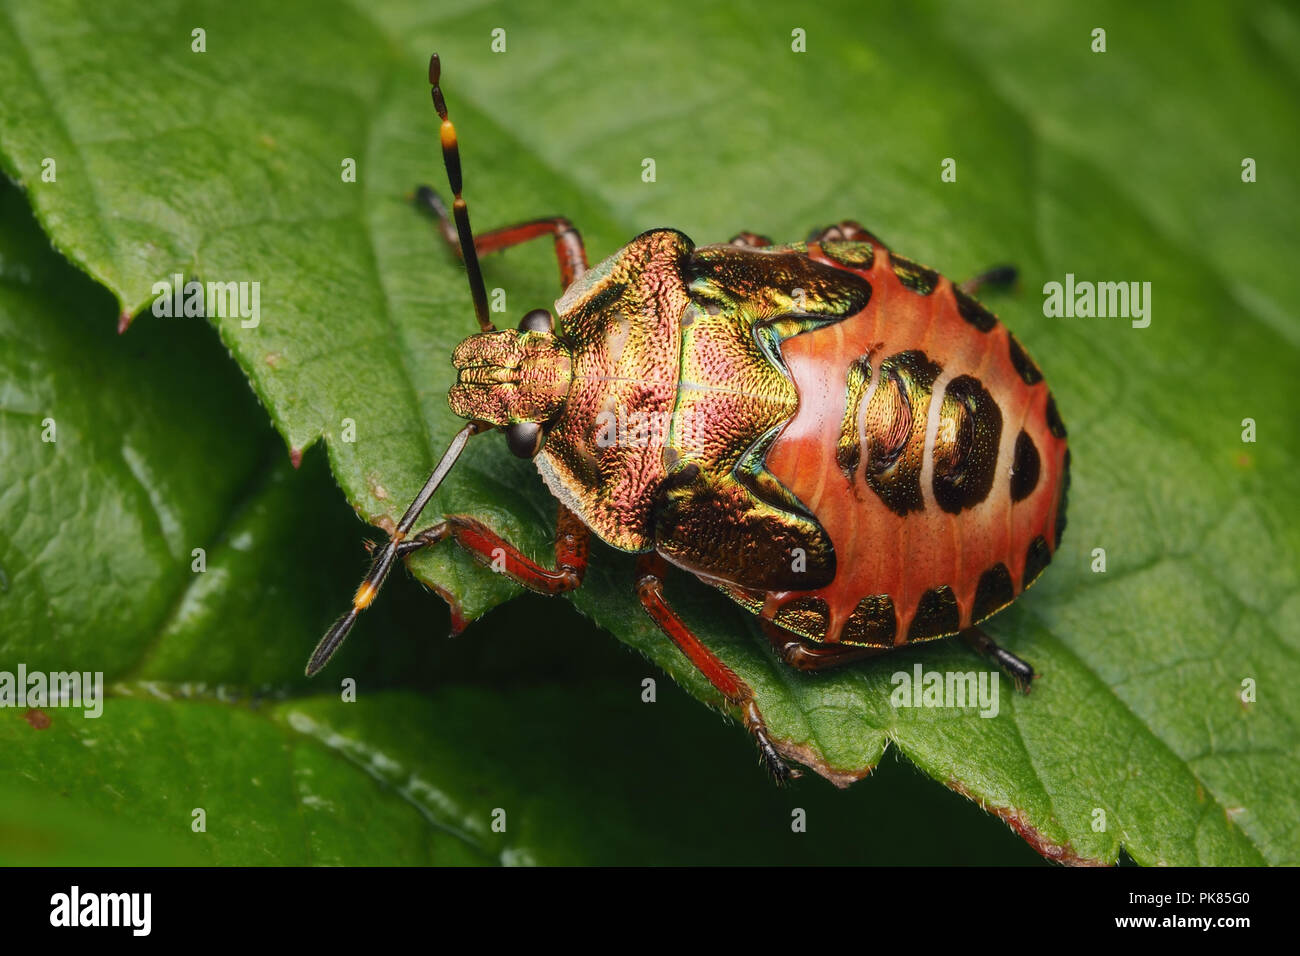 bronze-shieldbug-troilus-luridus-final-instar-nymph-on-bramble-tipperary-ireland-PK85G0.jpg